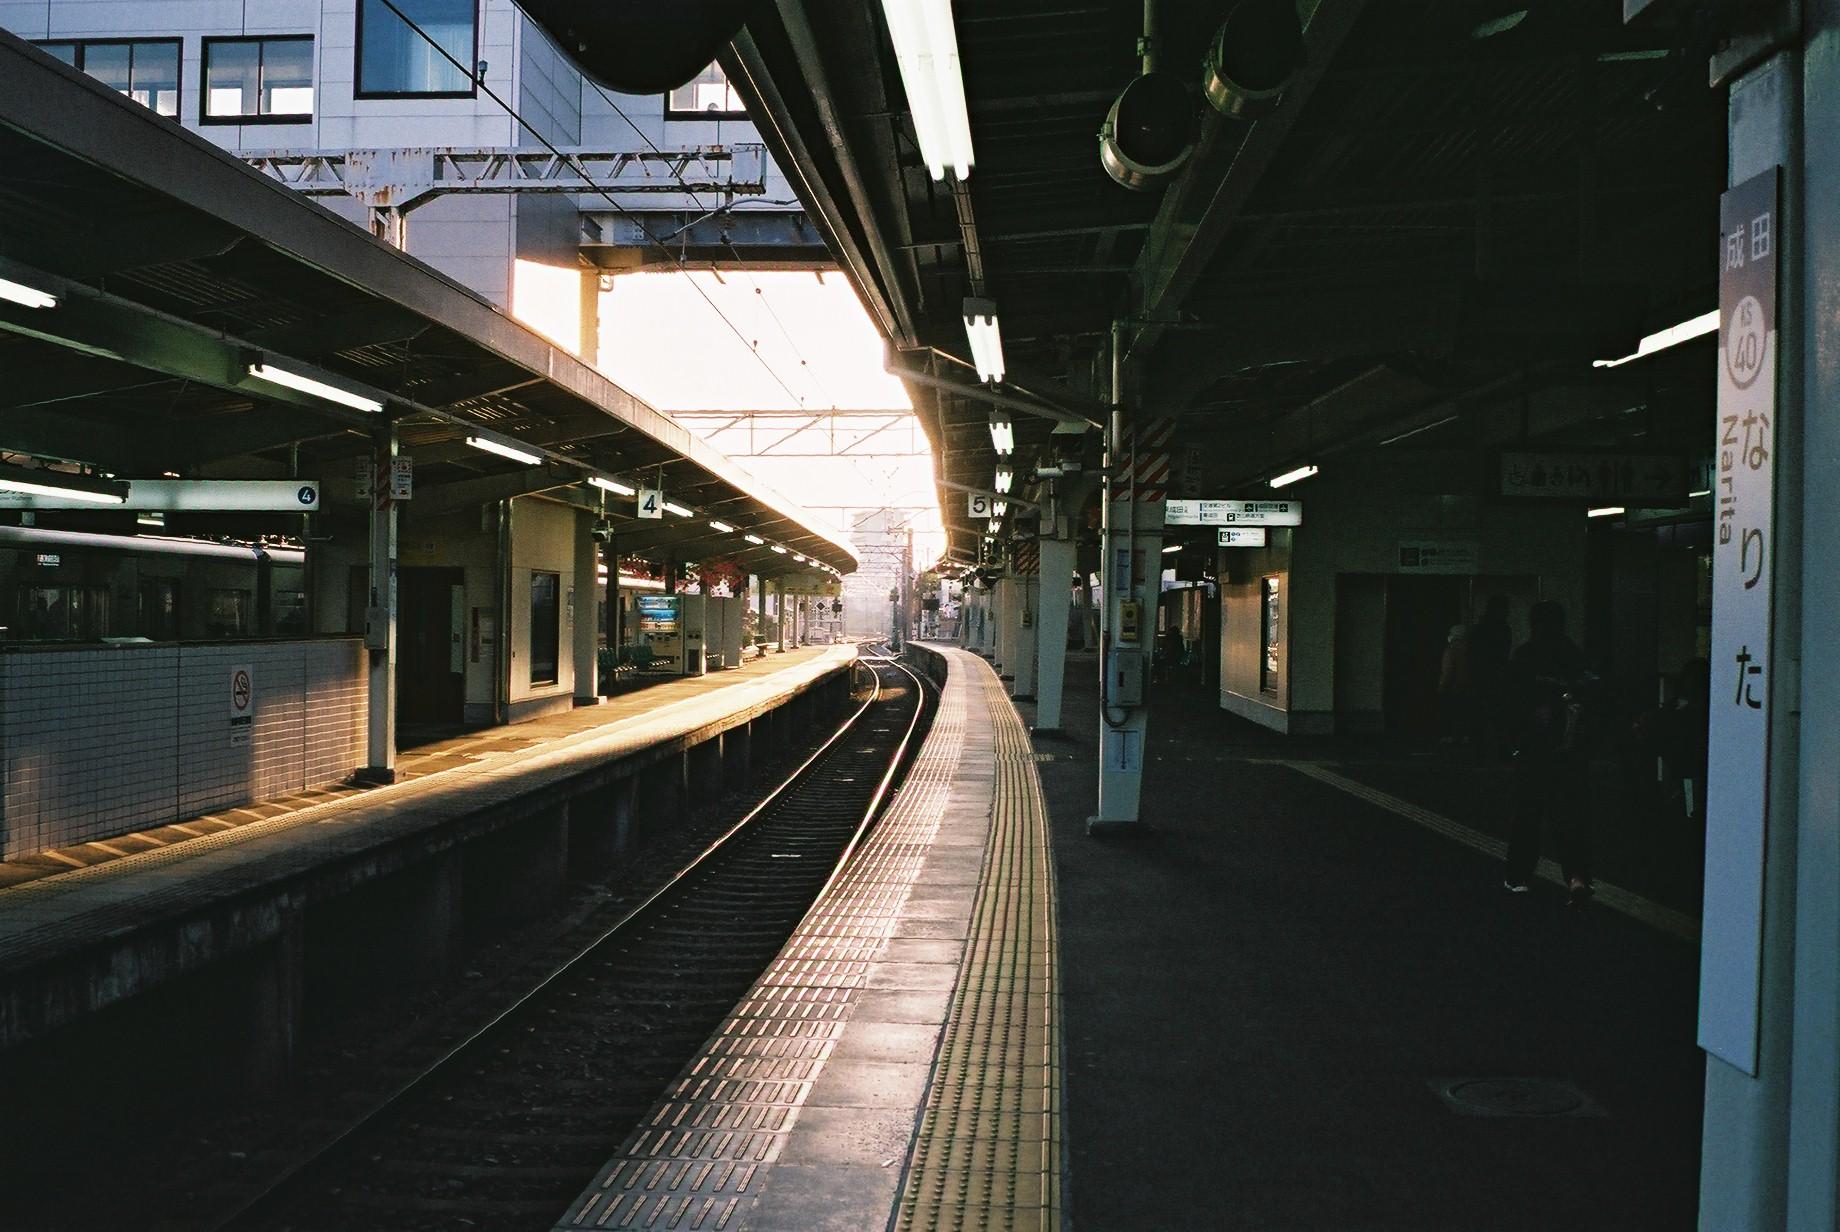 FH000013.JPG